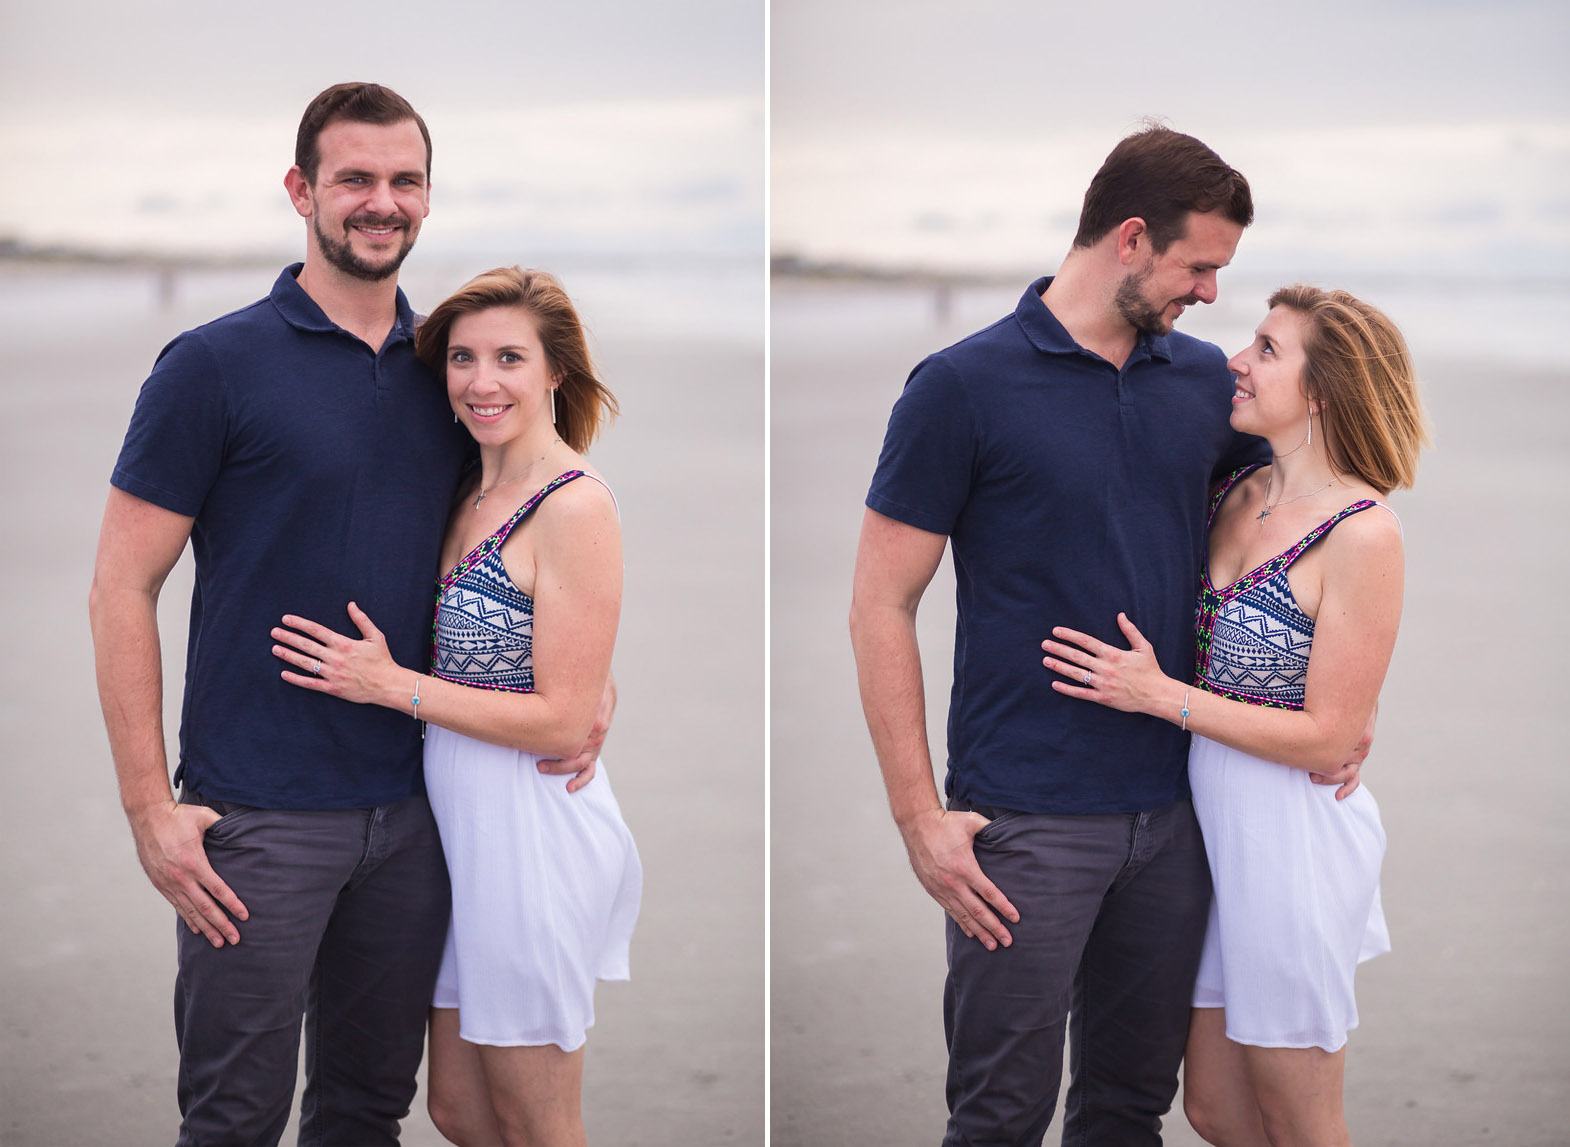 adam-szarmack-jacksonville-wedding-photographer-atlantic-beach-engagement-pictures-33.jpg